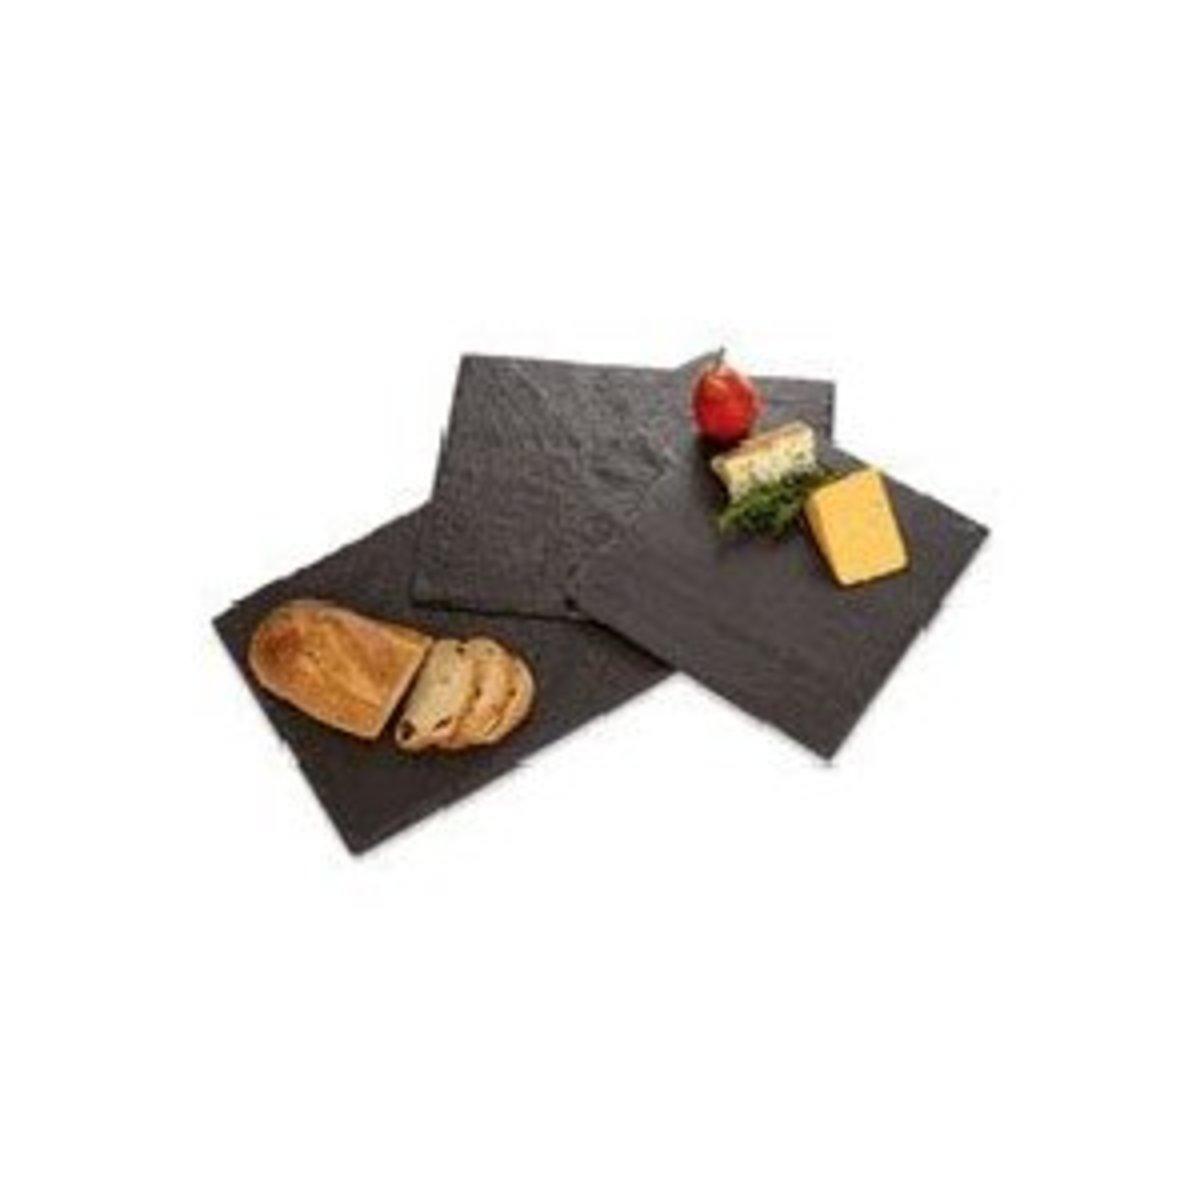 jk adams slate cheese tray